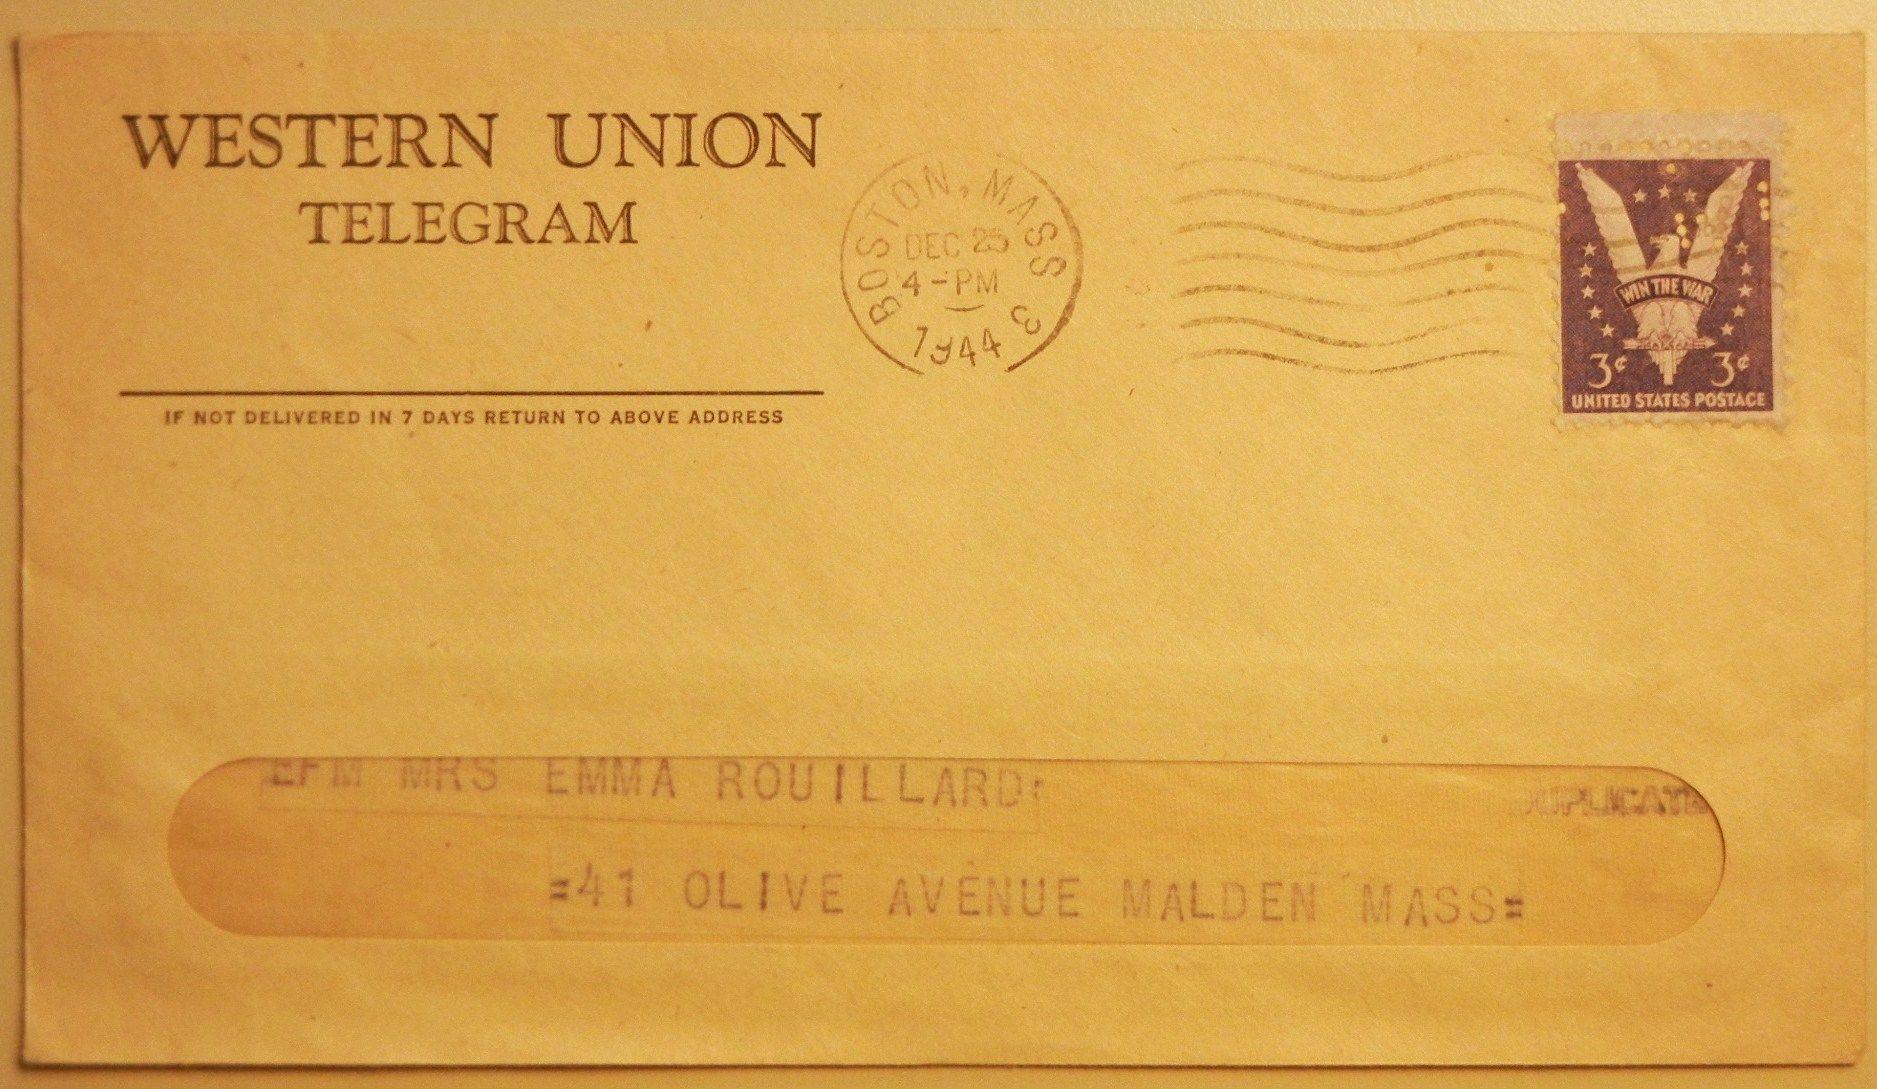 1920's Telegram Template - Google Search